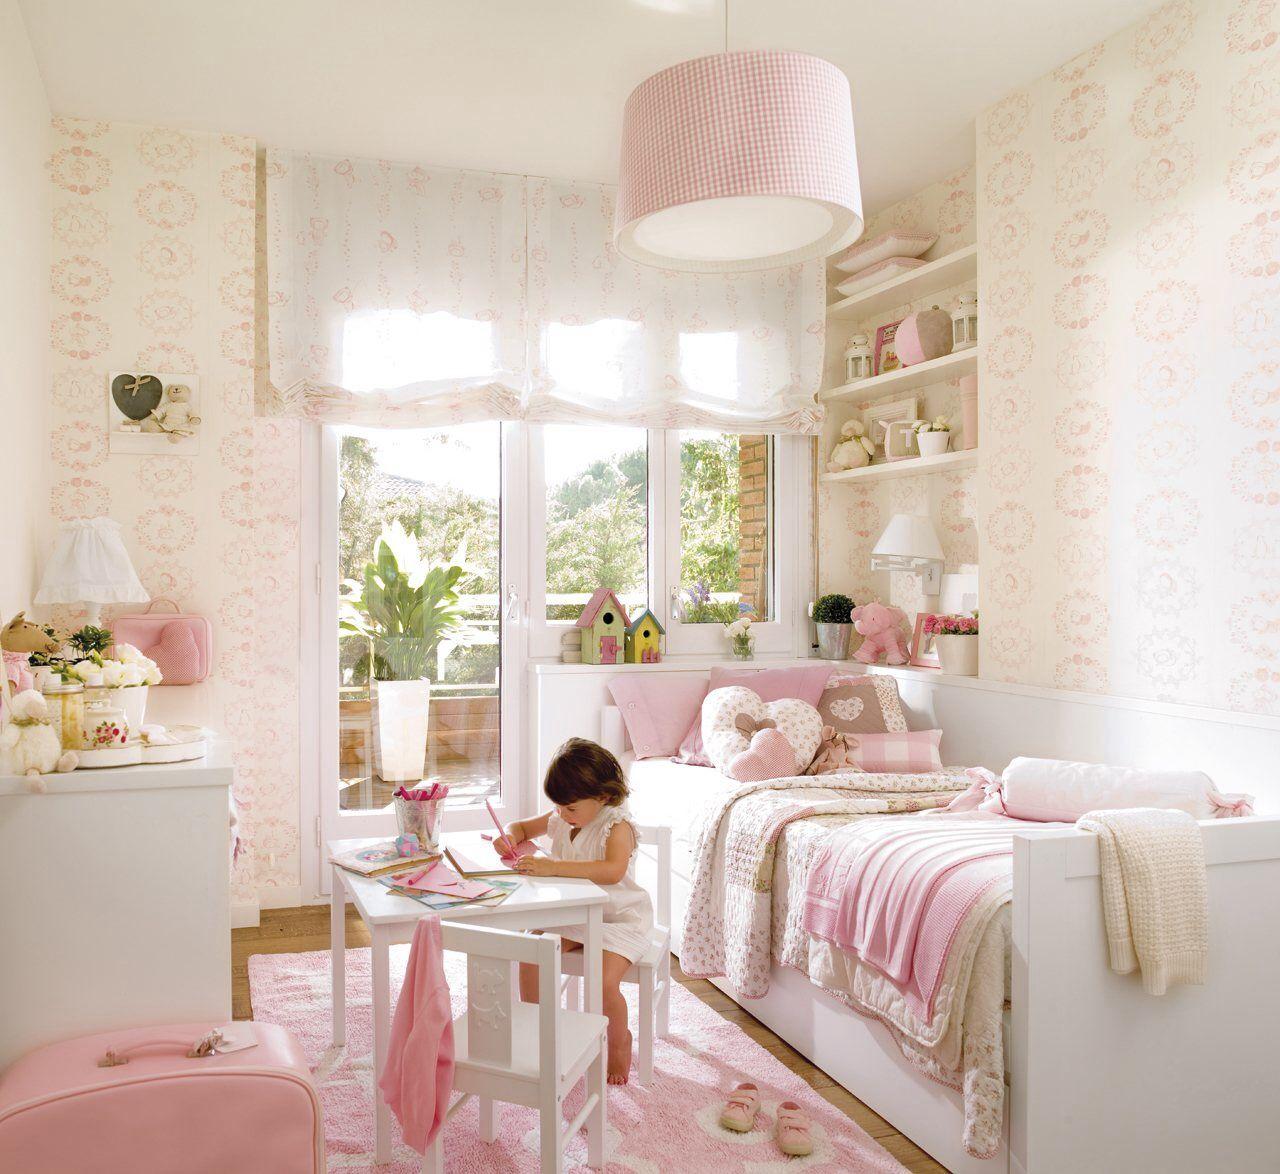 Habitación infantil Tu mueble | Bedrooms ideas | Pinterest ...